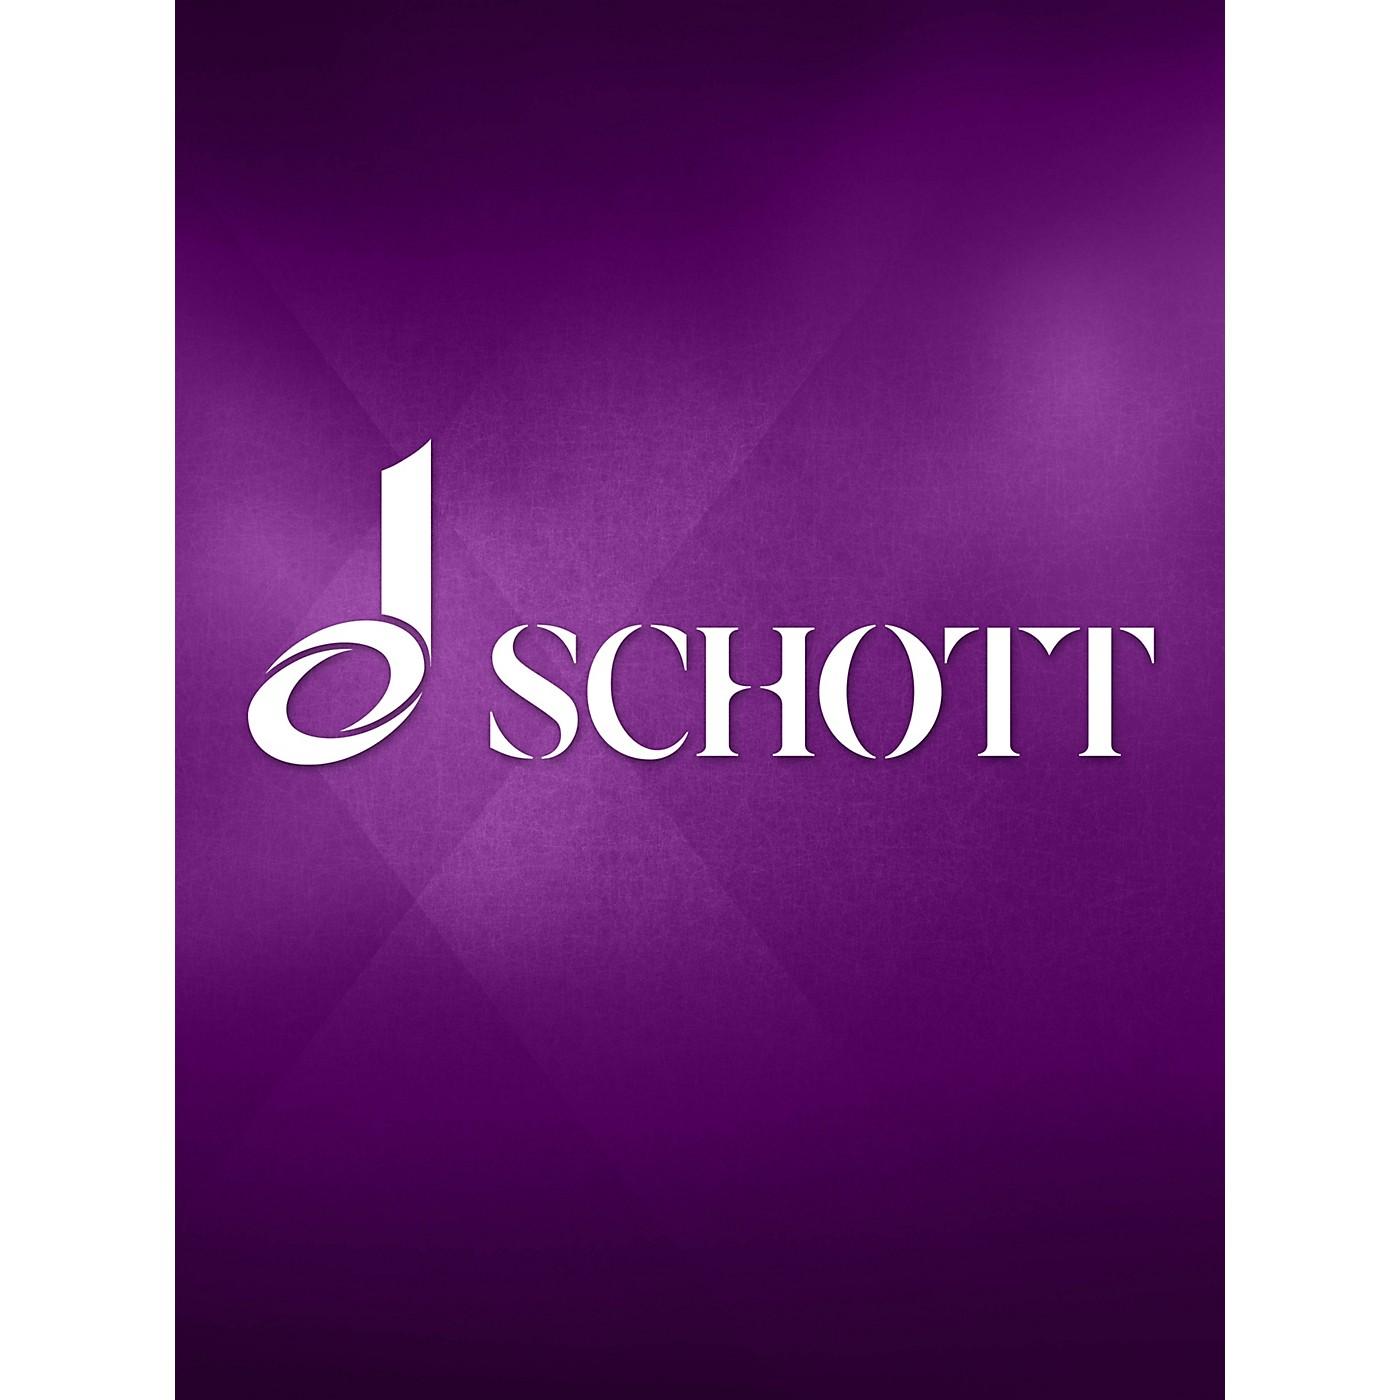 Schott Symphony 2 (Christmas Symphony) (Orchestra Study Score) Schott Series Composed by Krzysztof Penderecki thumbnail